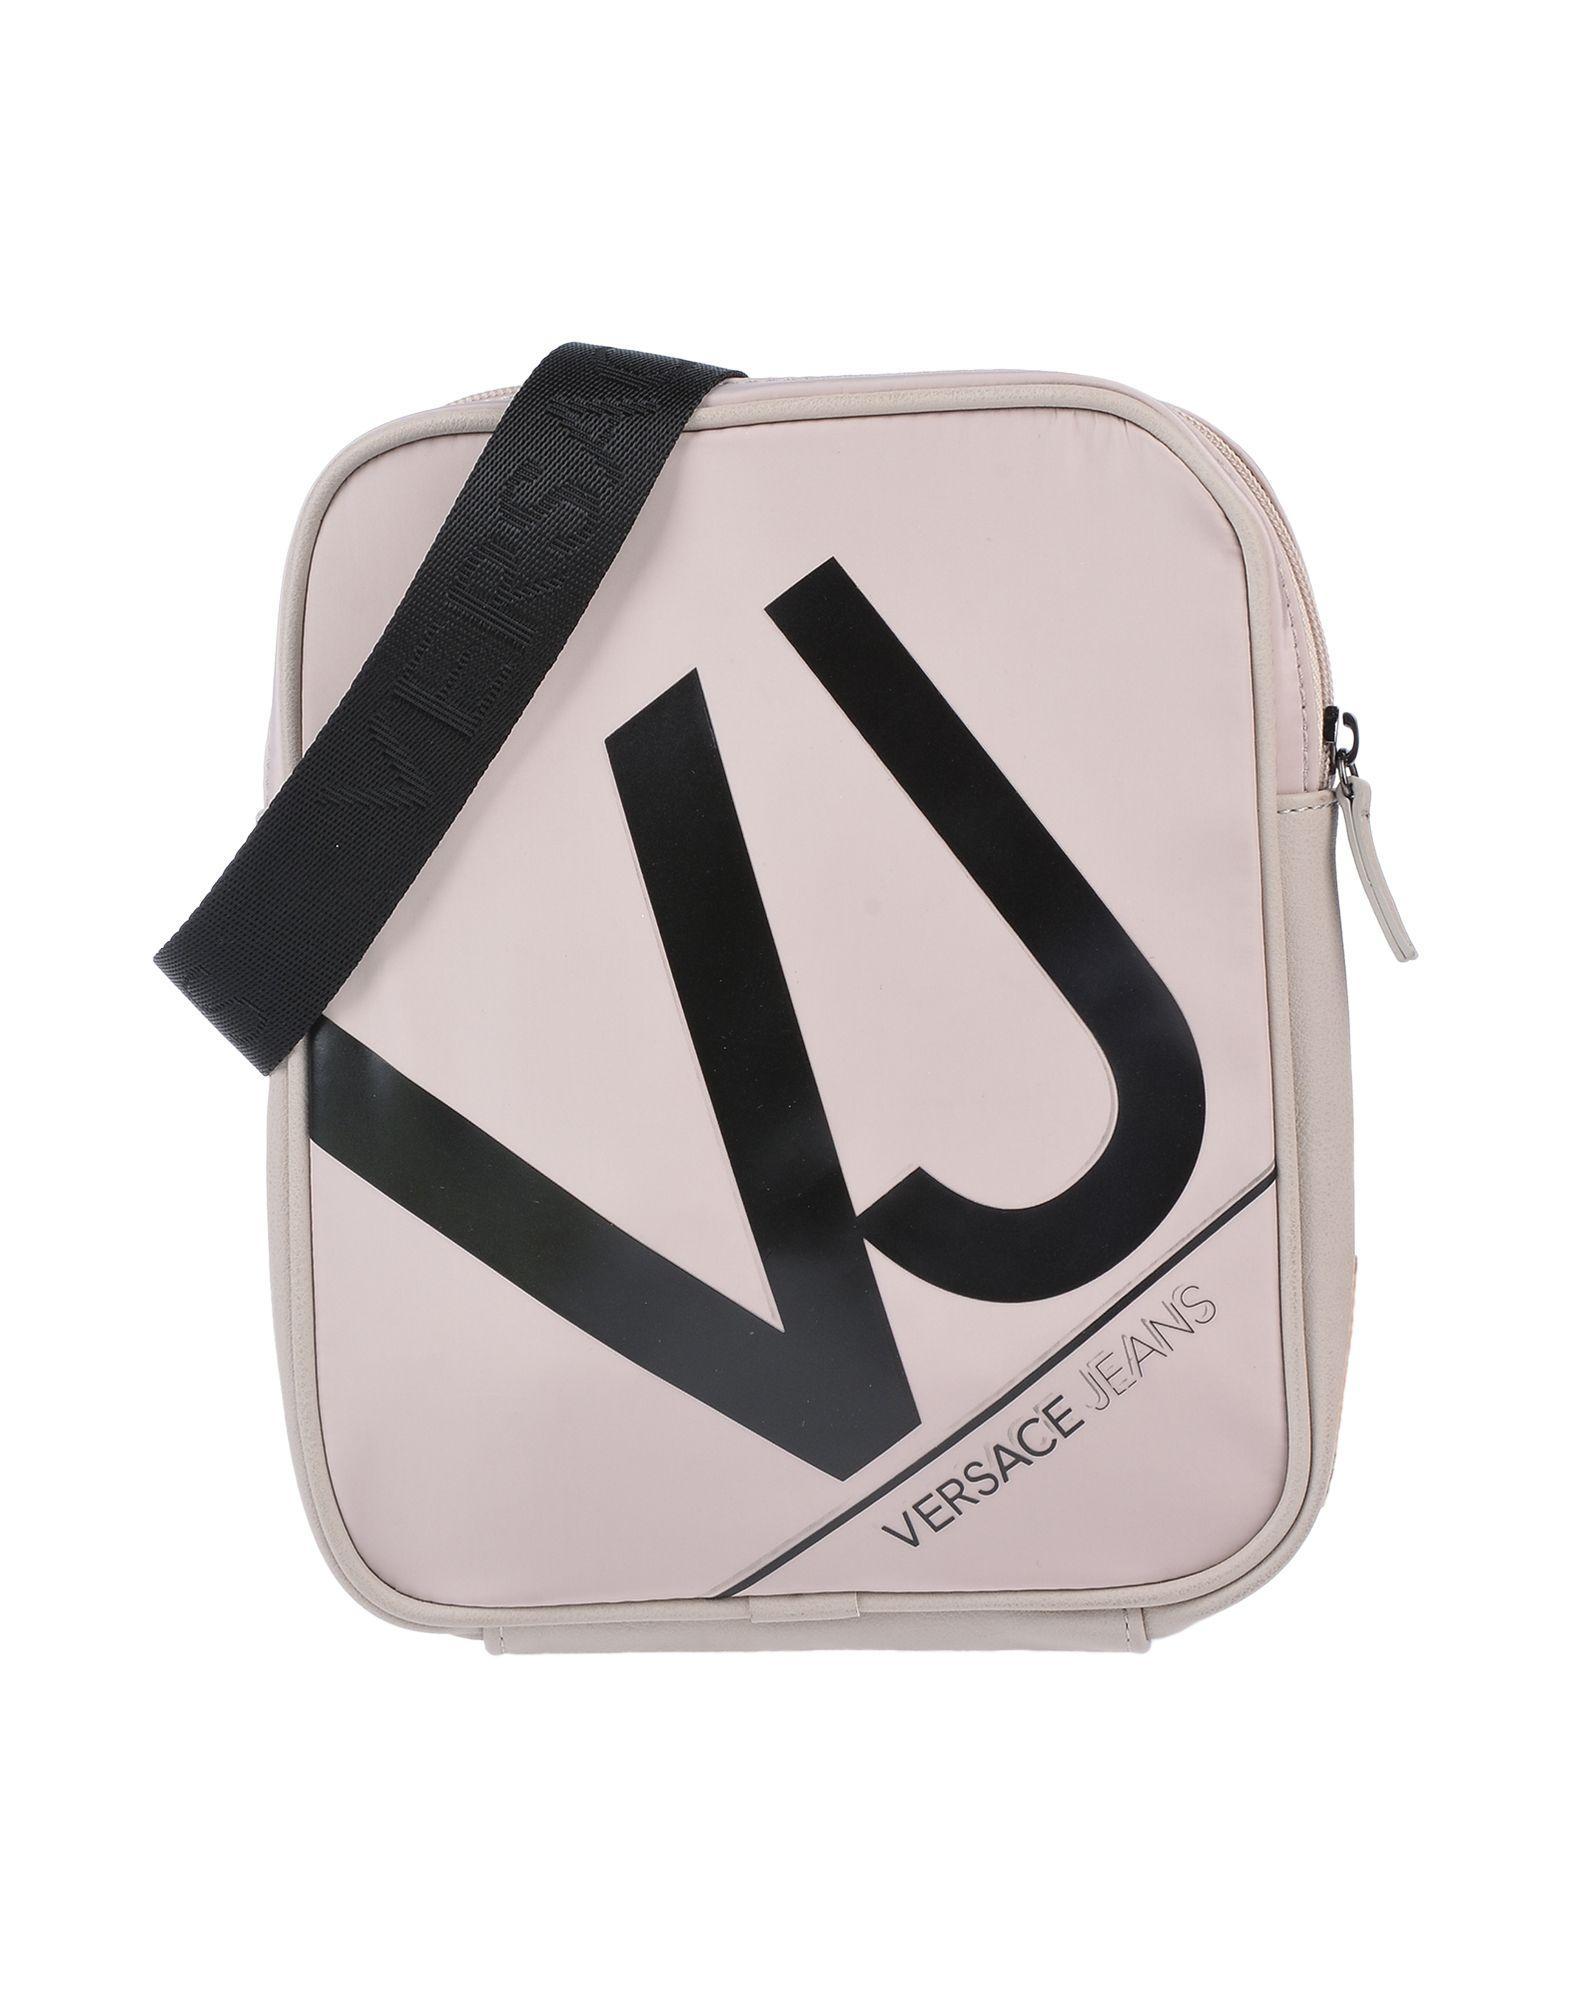 58a7903c720c Versace Jeans - Brown Cross-body Bag for Men - Lyst. View fullscreen